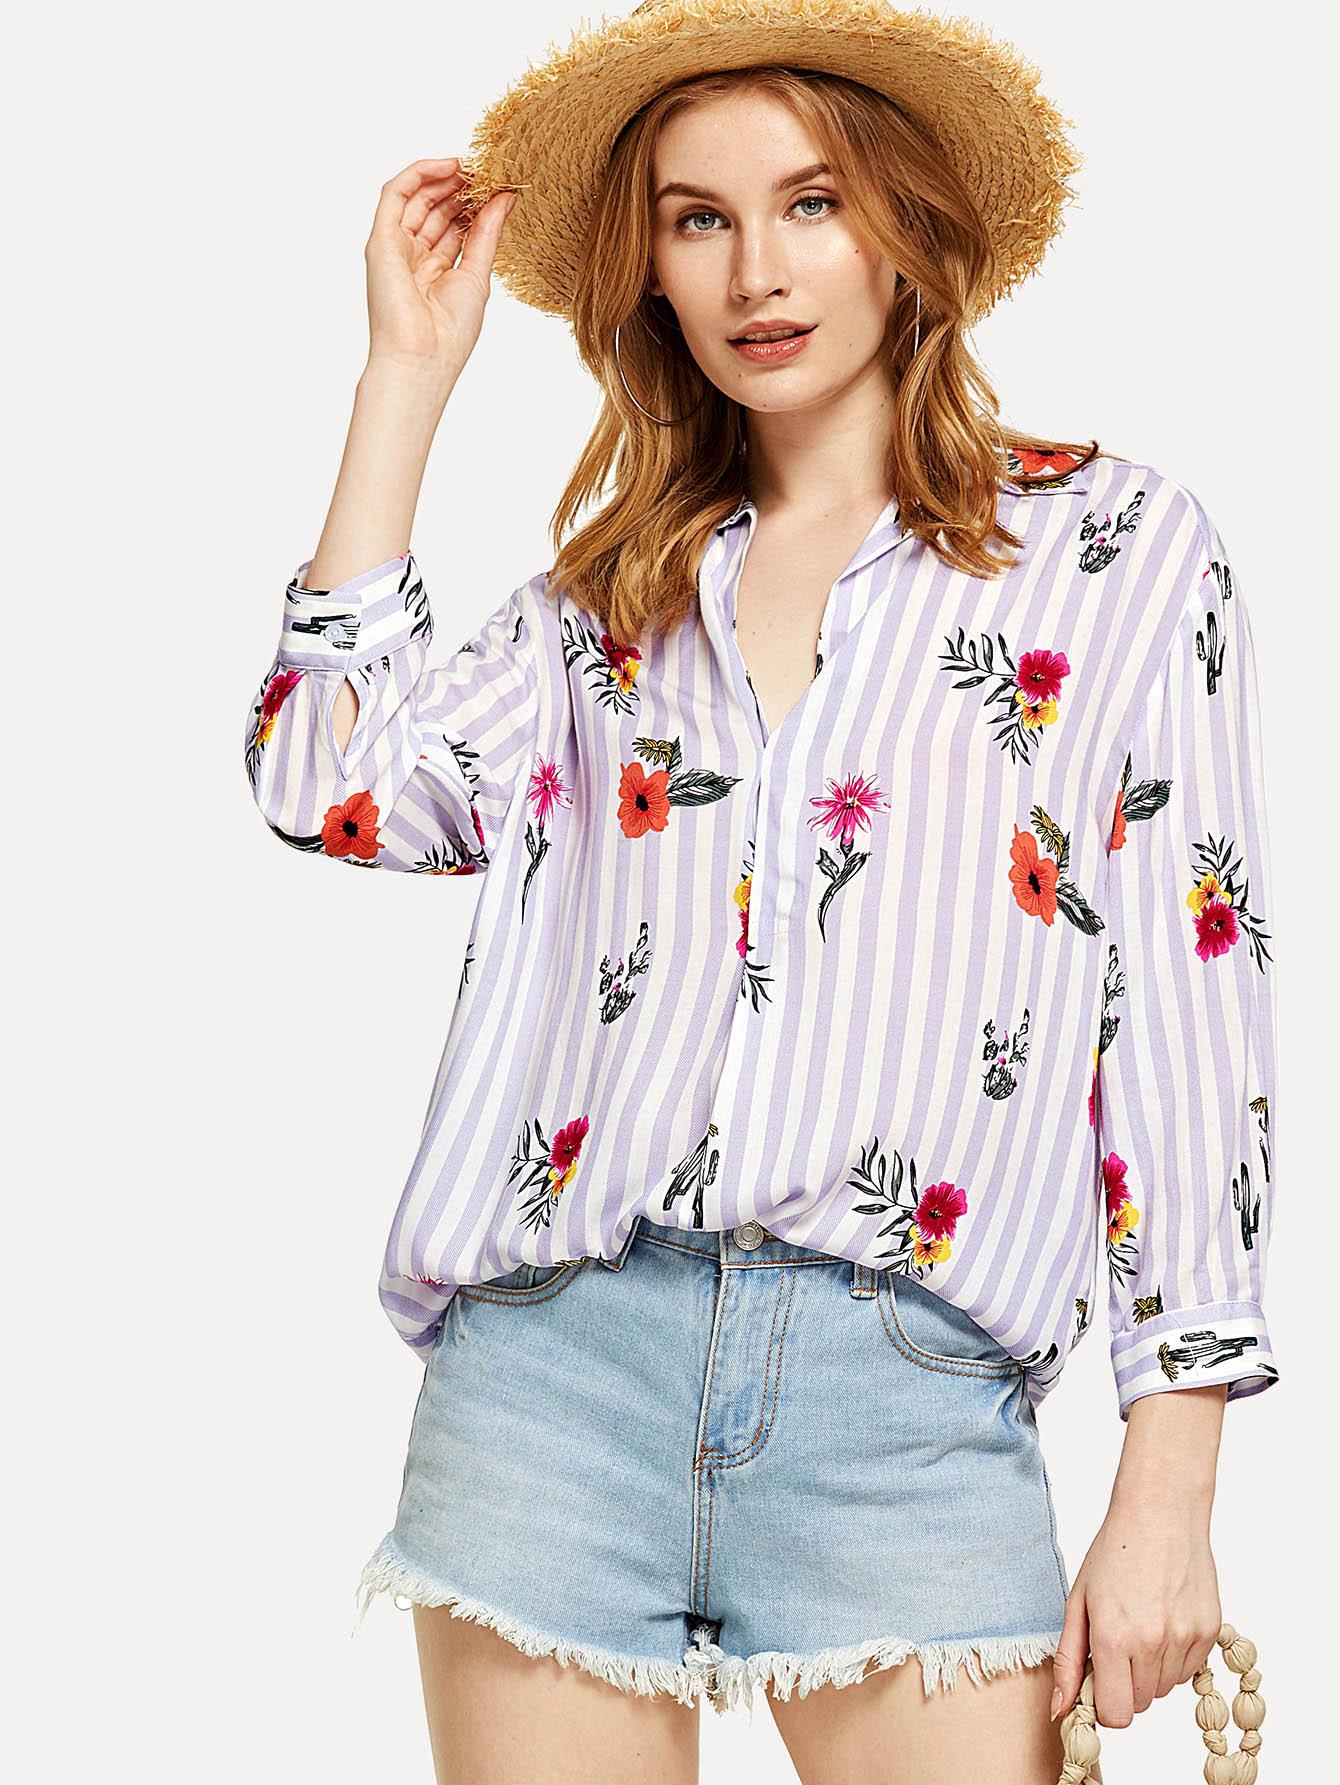 Flower And Stripe Print Curved Hem Shirt pocket patch curved hem snake skin print shirt